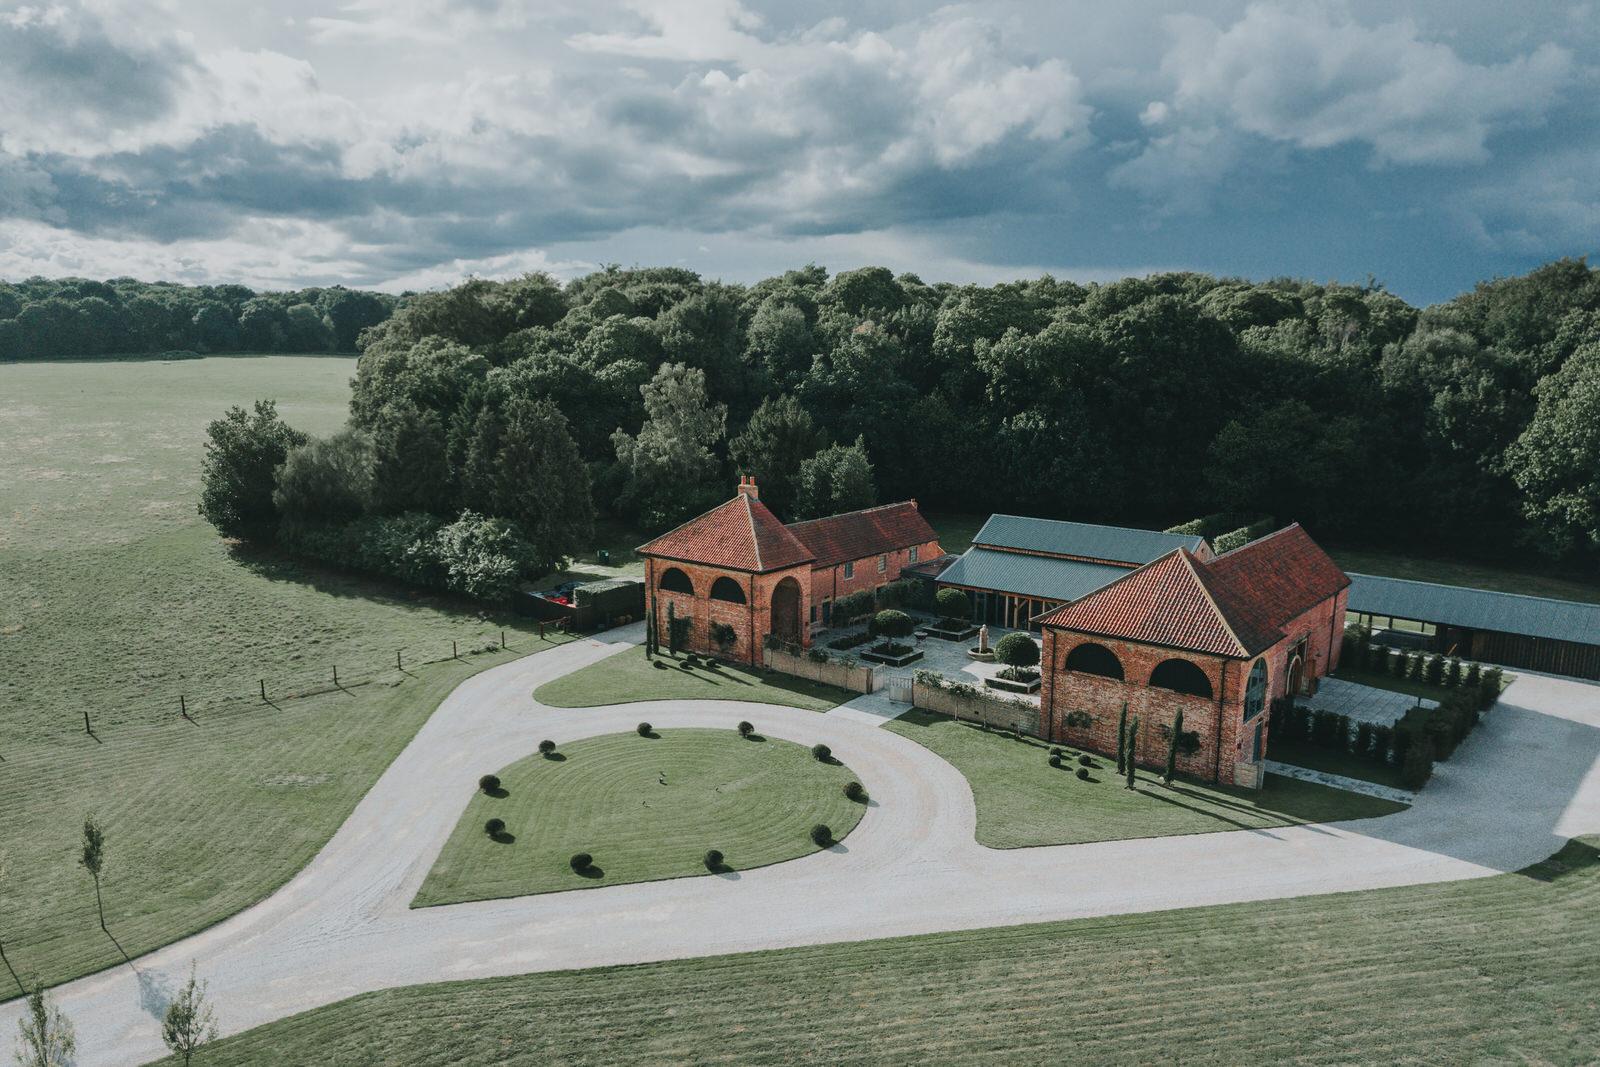 Hazel Gap Barn -Chris Snowden Photography - Summer 2018 - Alex & Harrison (476)hazel+gap+nottinghamshire+wedding+venue.jpg